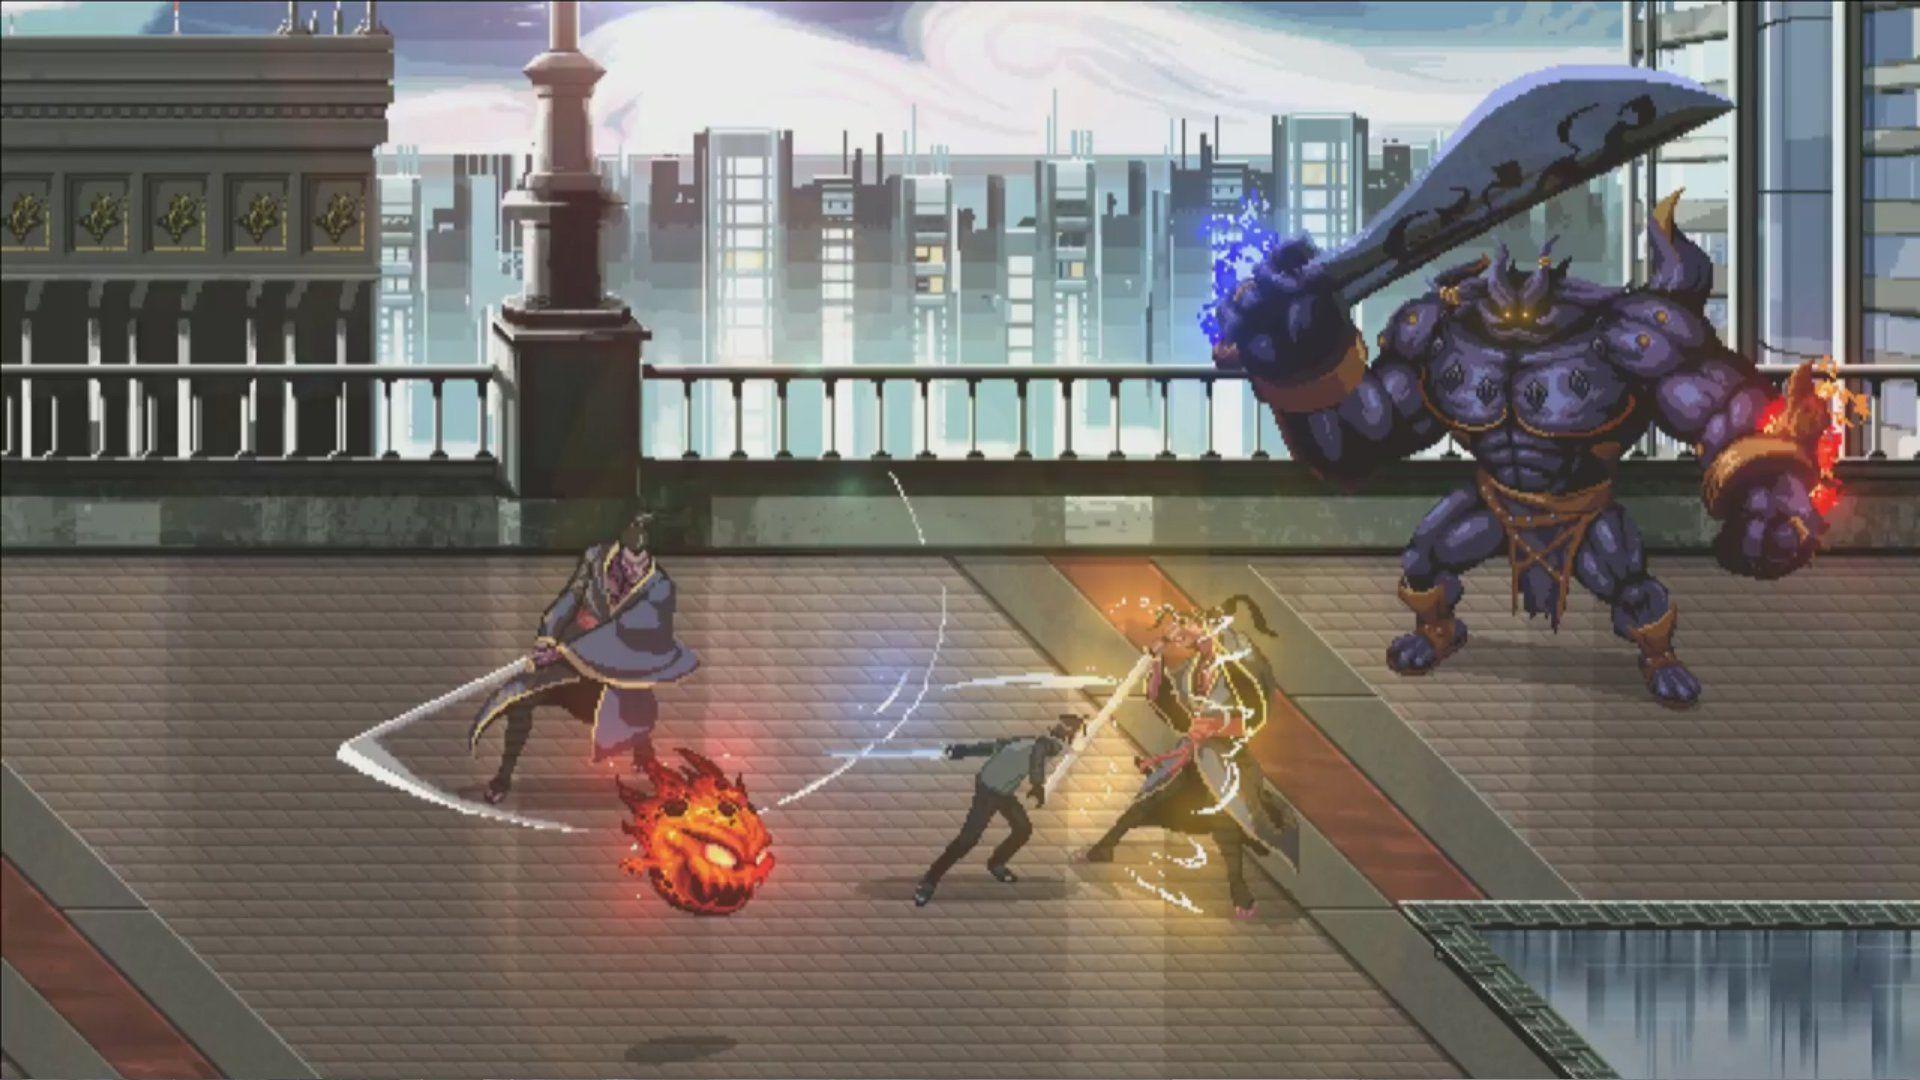 Final Fantasy XV A King's Tale preorder bonus revealed